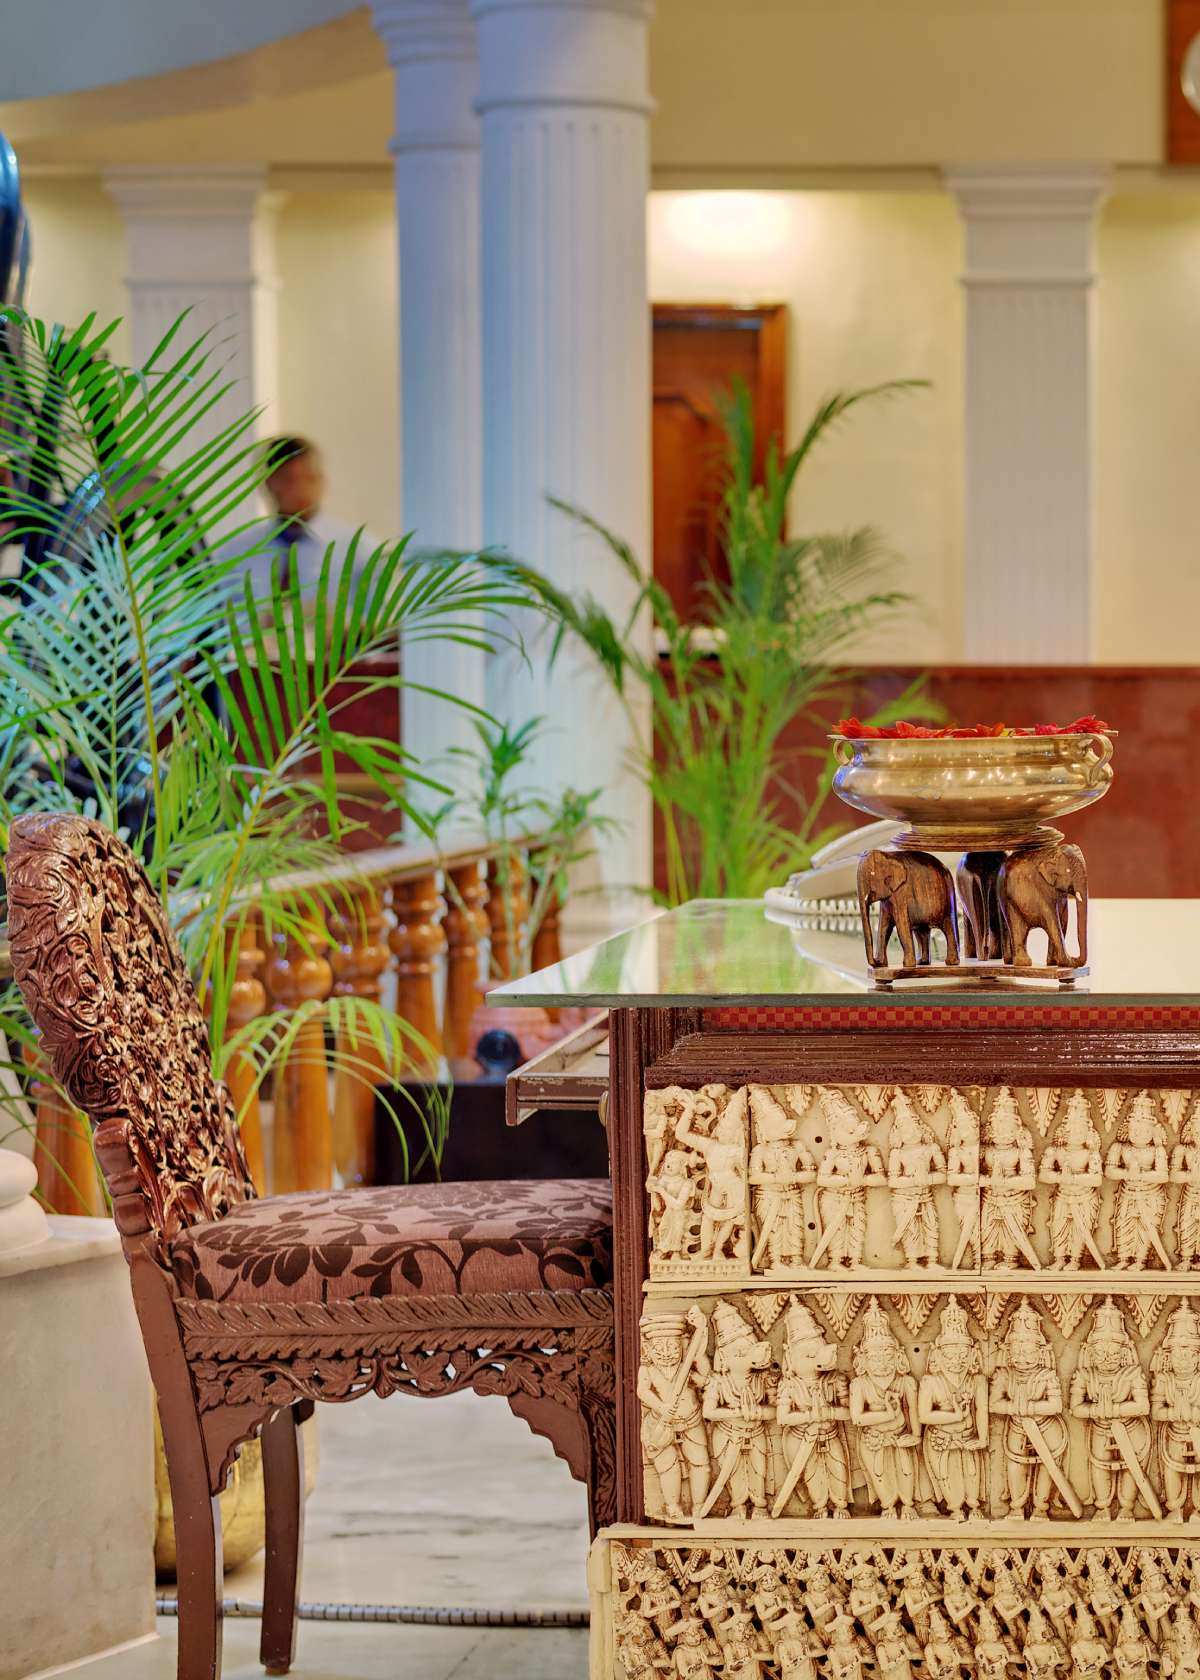 chennai reception 10x14 1 - The Ambassador | Heritage Hotels in Mumbai, Aurangabad, Chennai - Ambassador Pallava Chennai